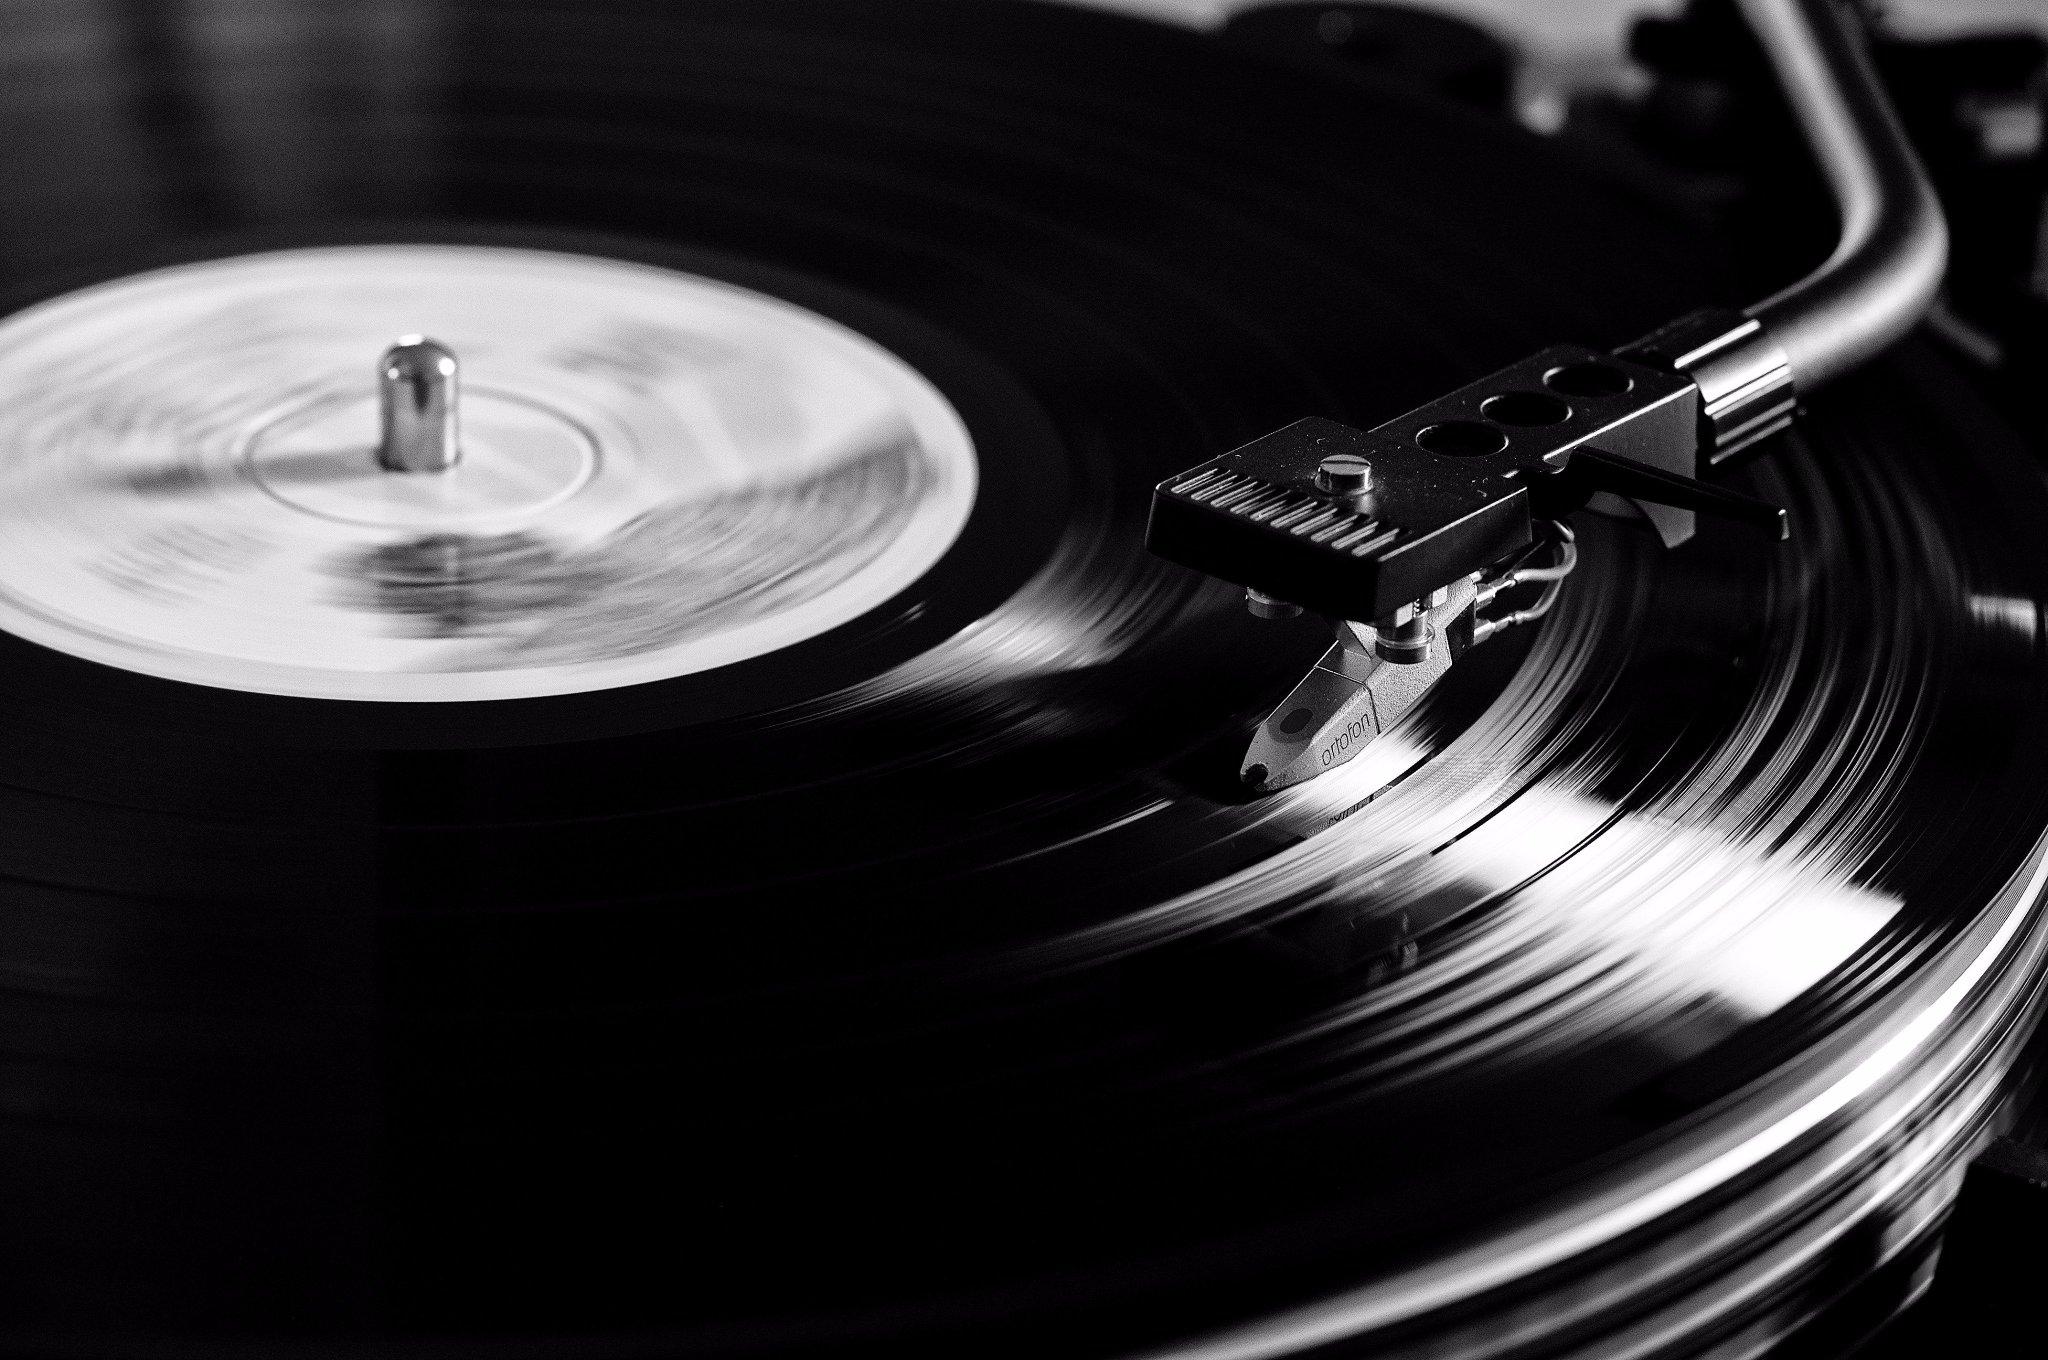 Thumbnail for DIYMC 2.8.17 Preparing for an Album Release